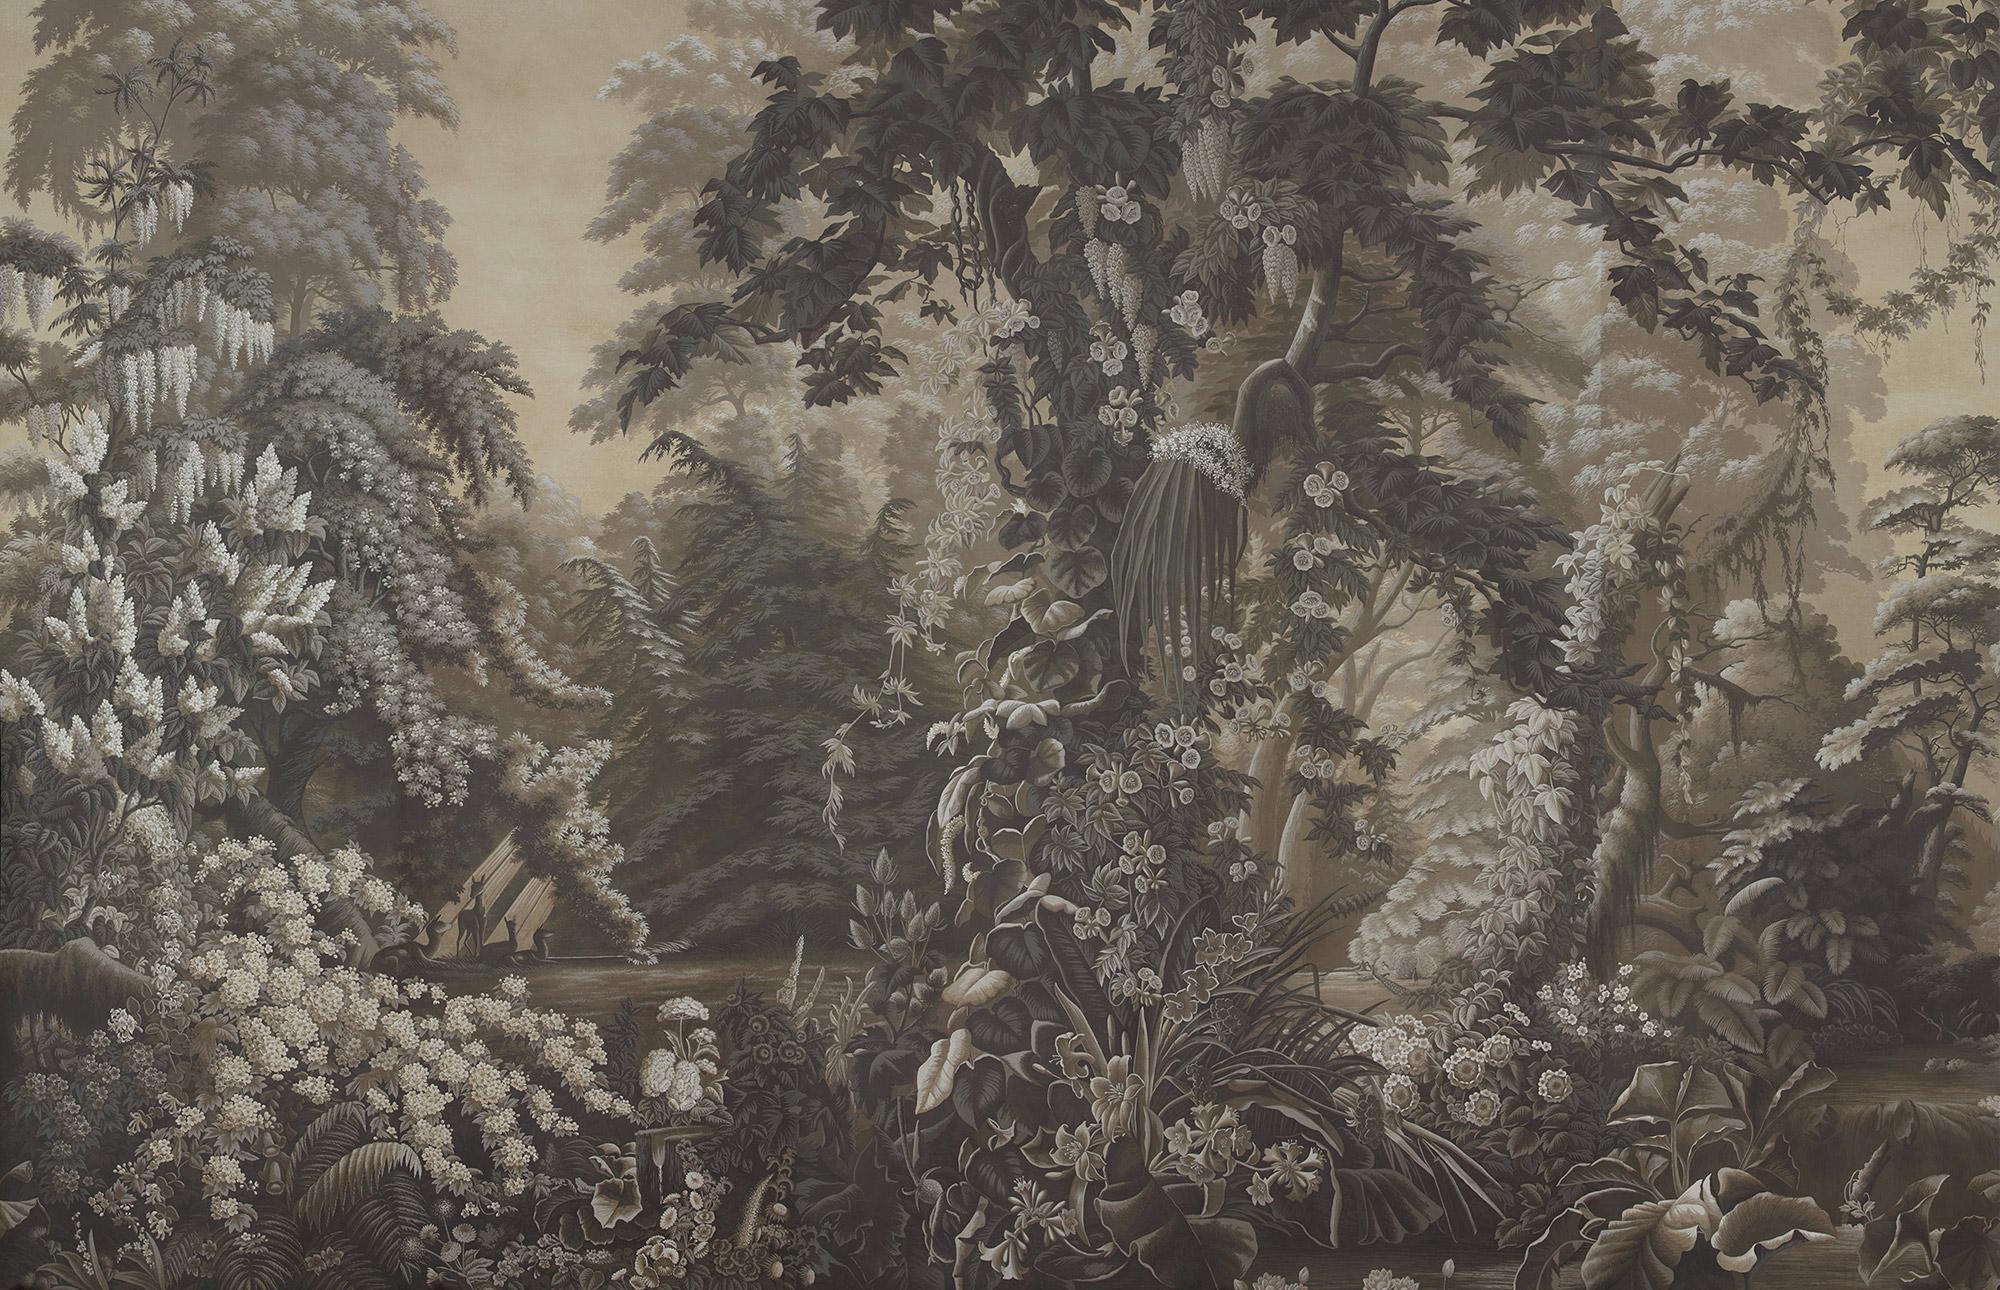 Eau Forte on antique scenic Xuan paper